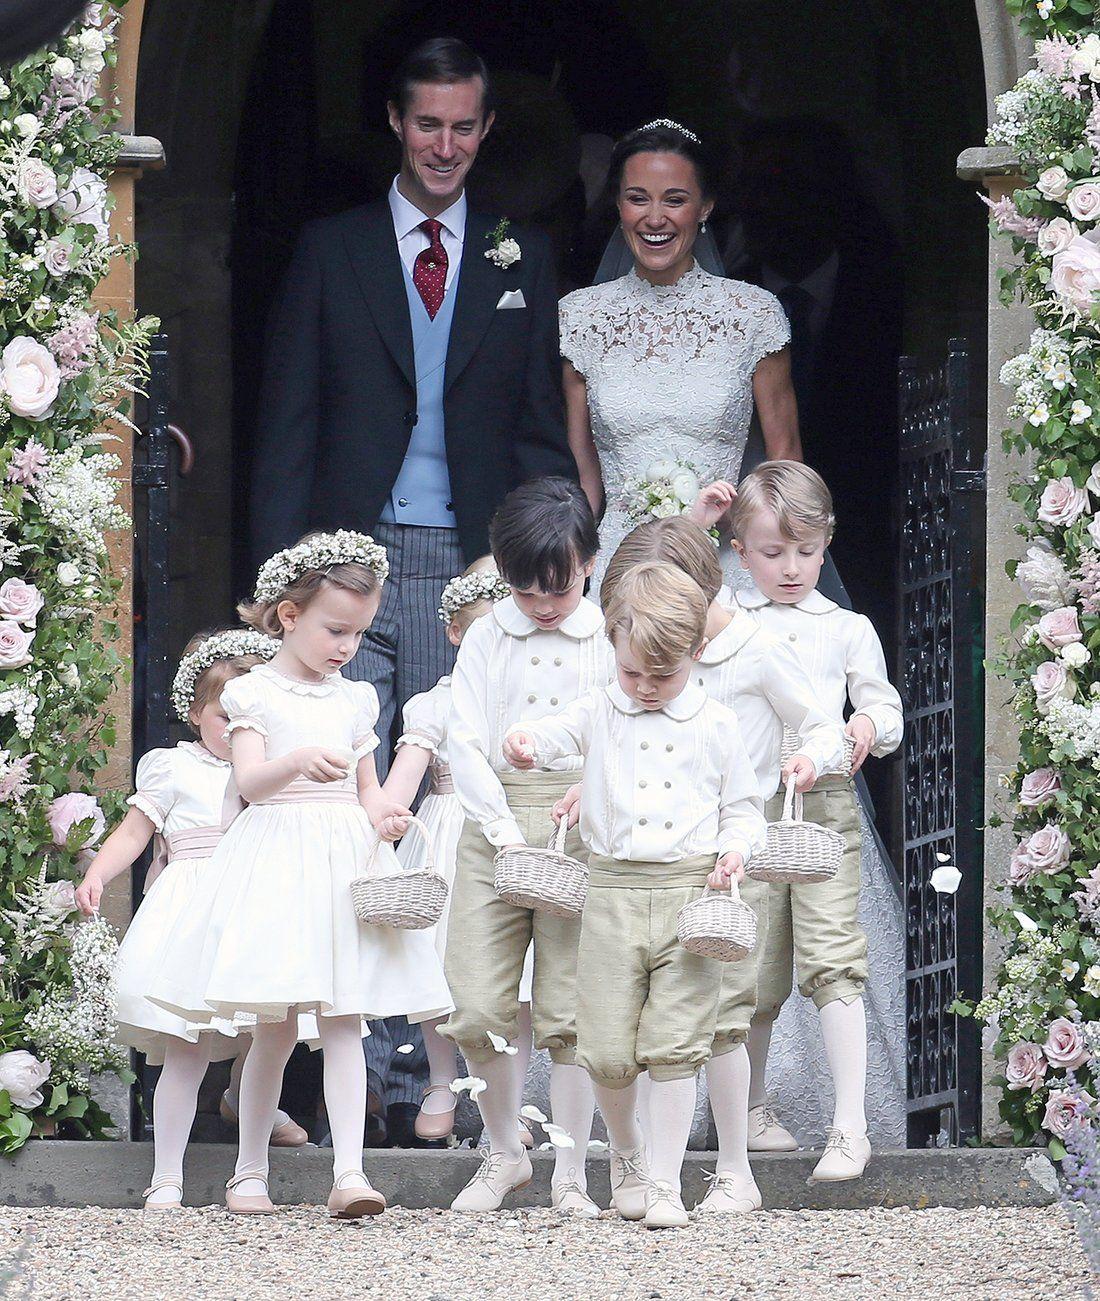 Mama june wedding dress  Pippa Middleton Welcomes a Baby Boy with Husband James Matthews